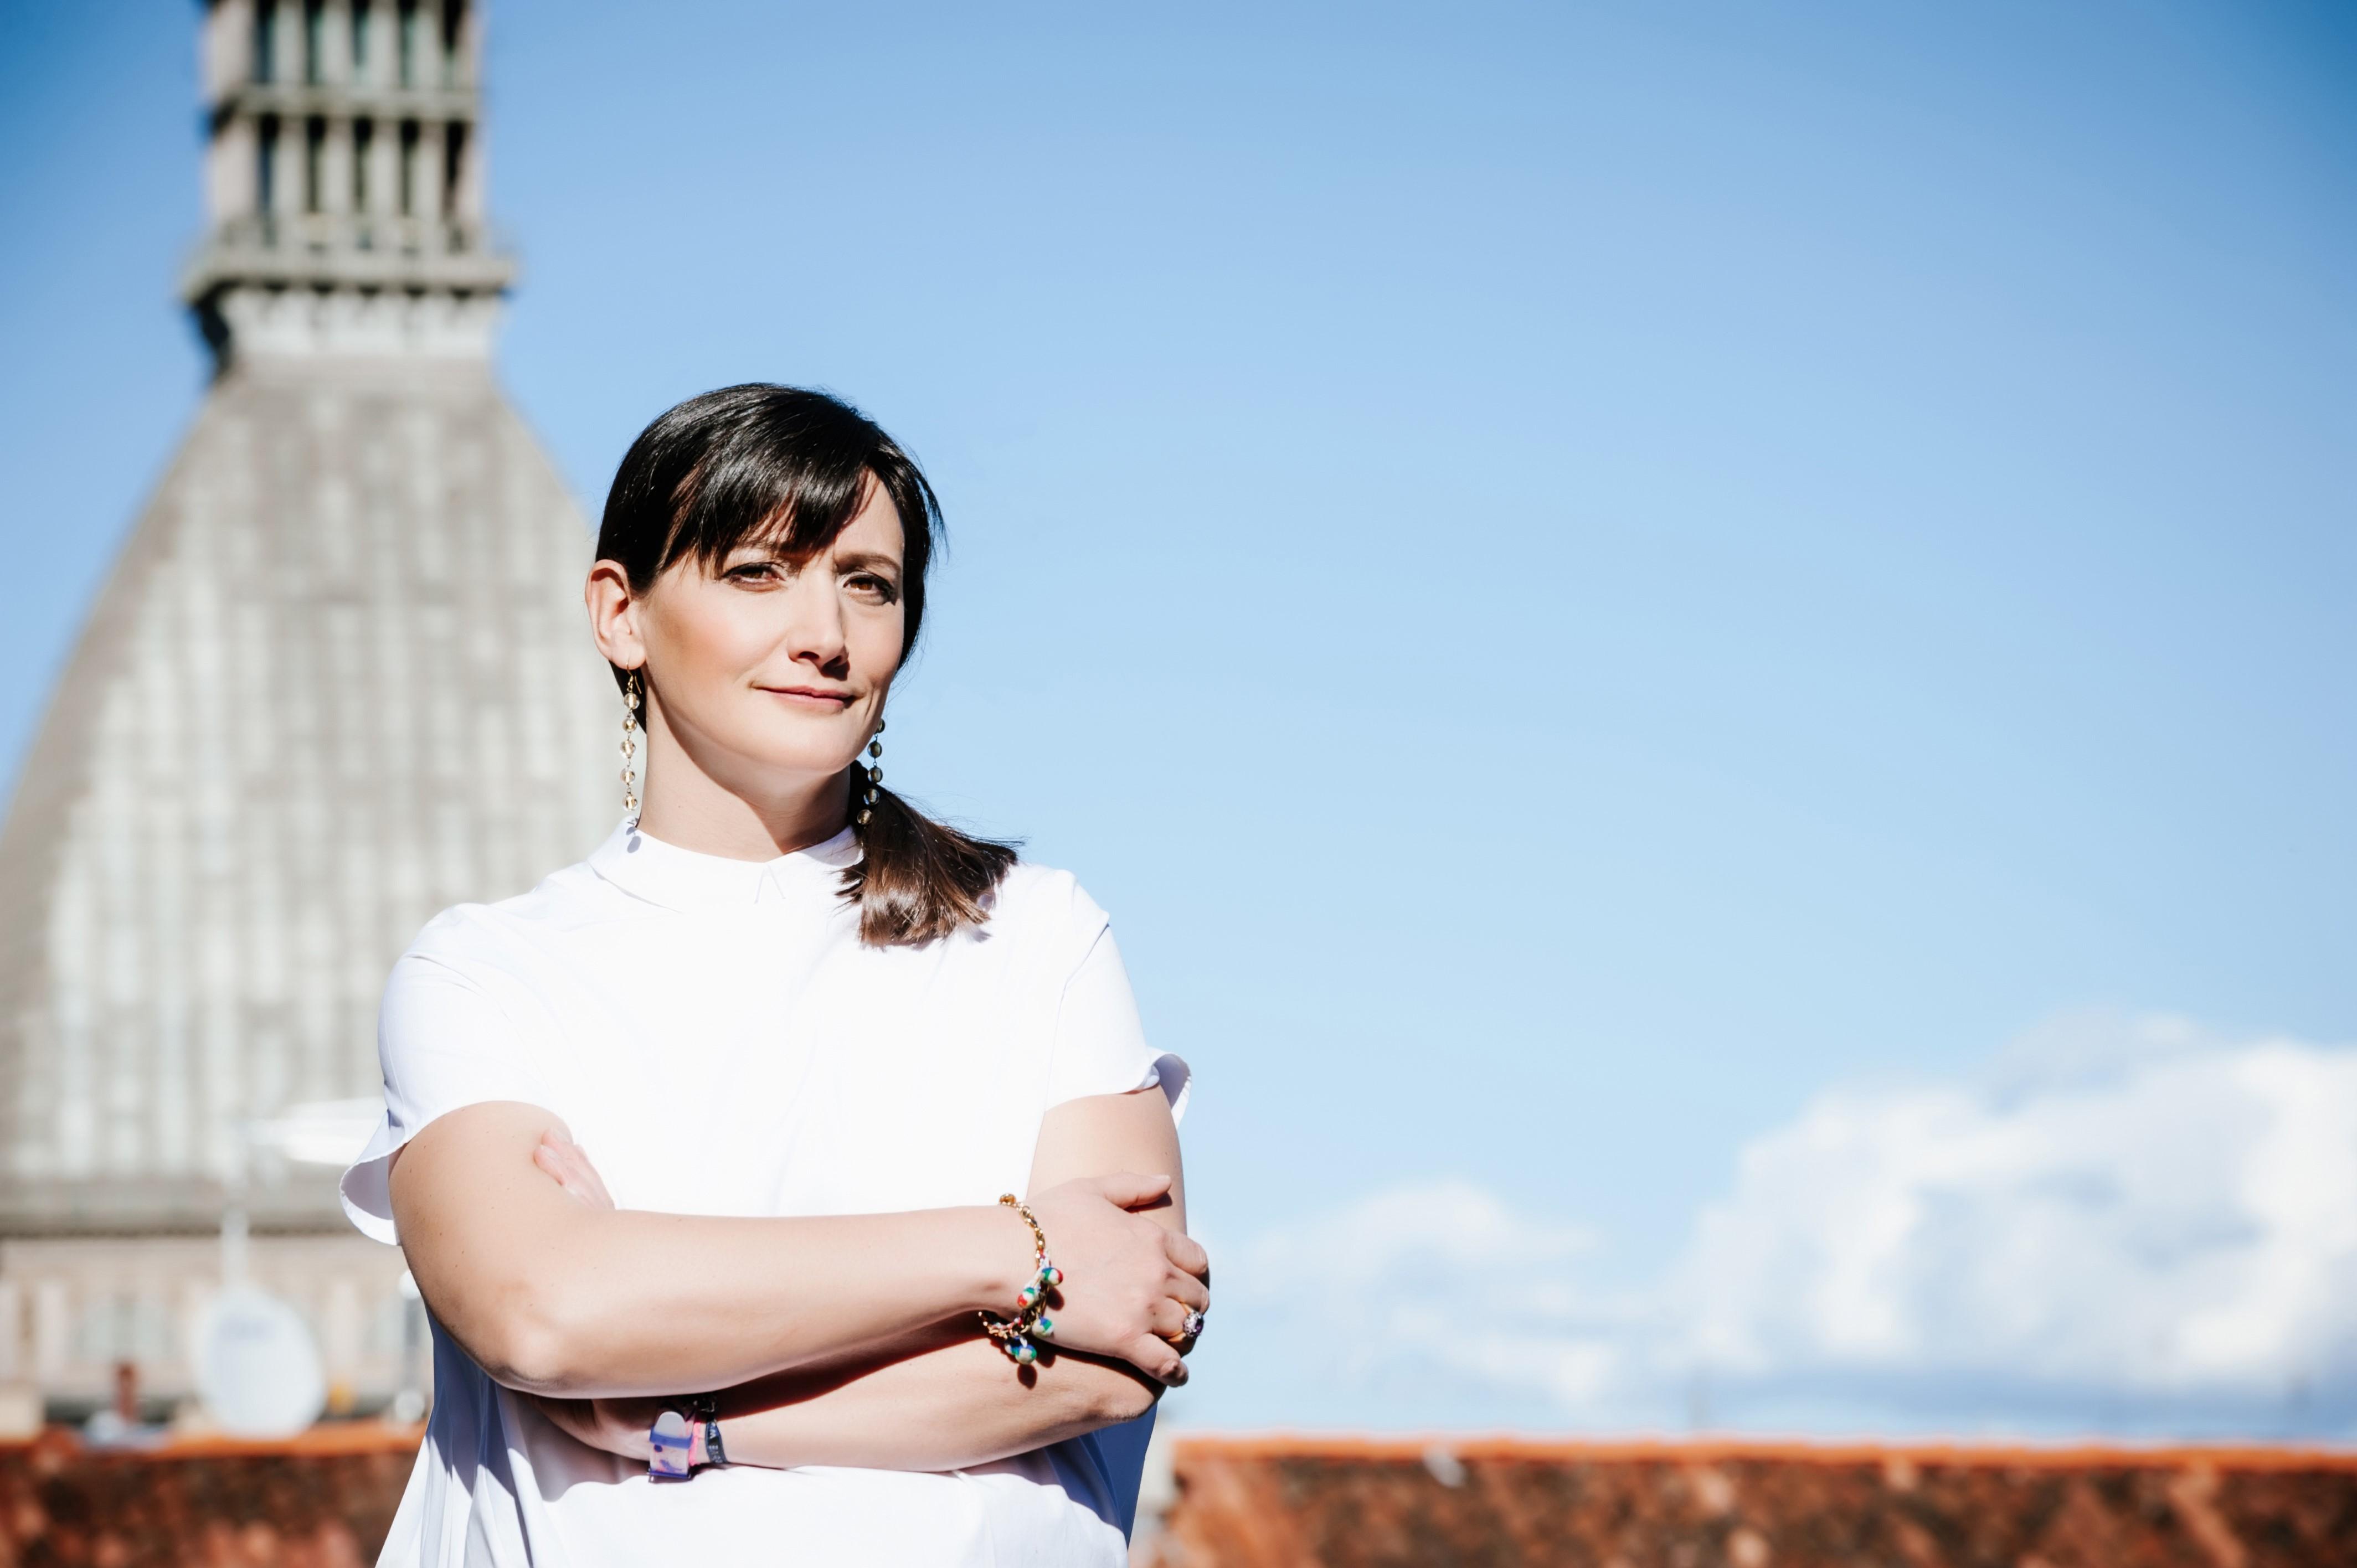 Ilaria Bonacossa. Photo © Silvia Pastore